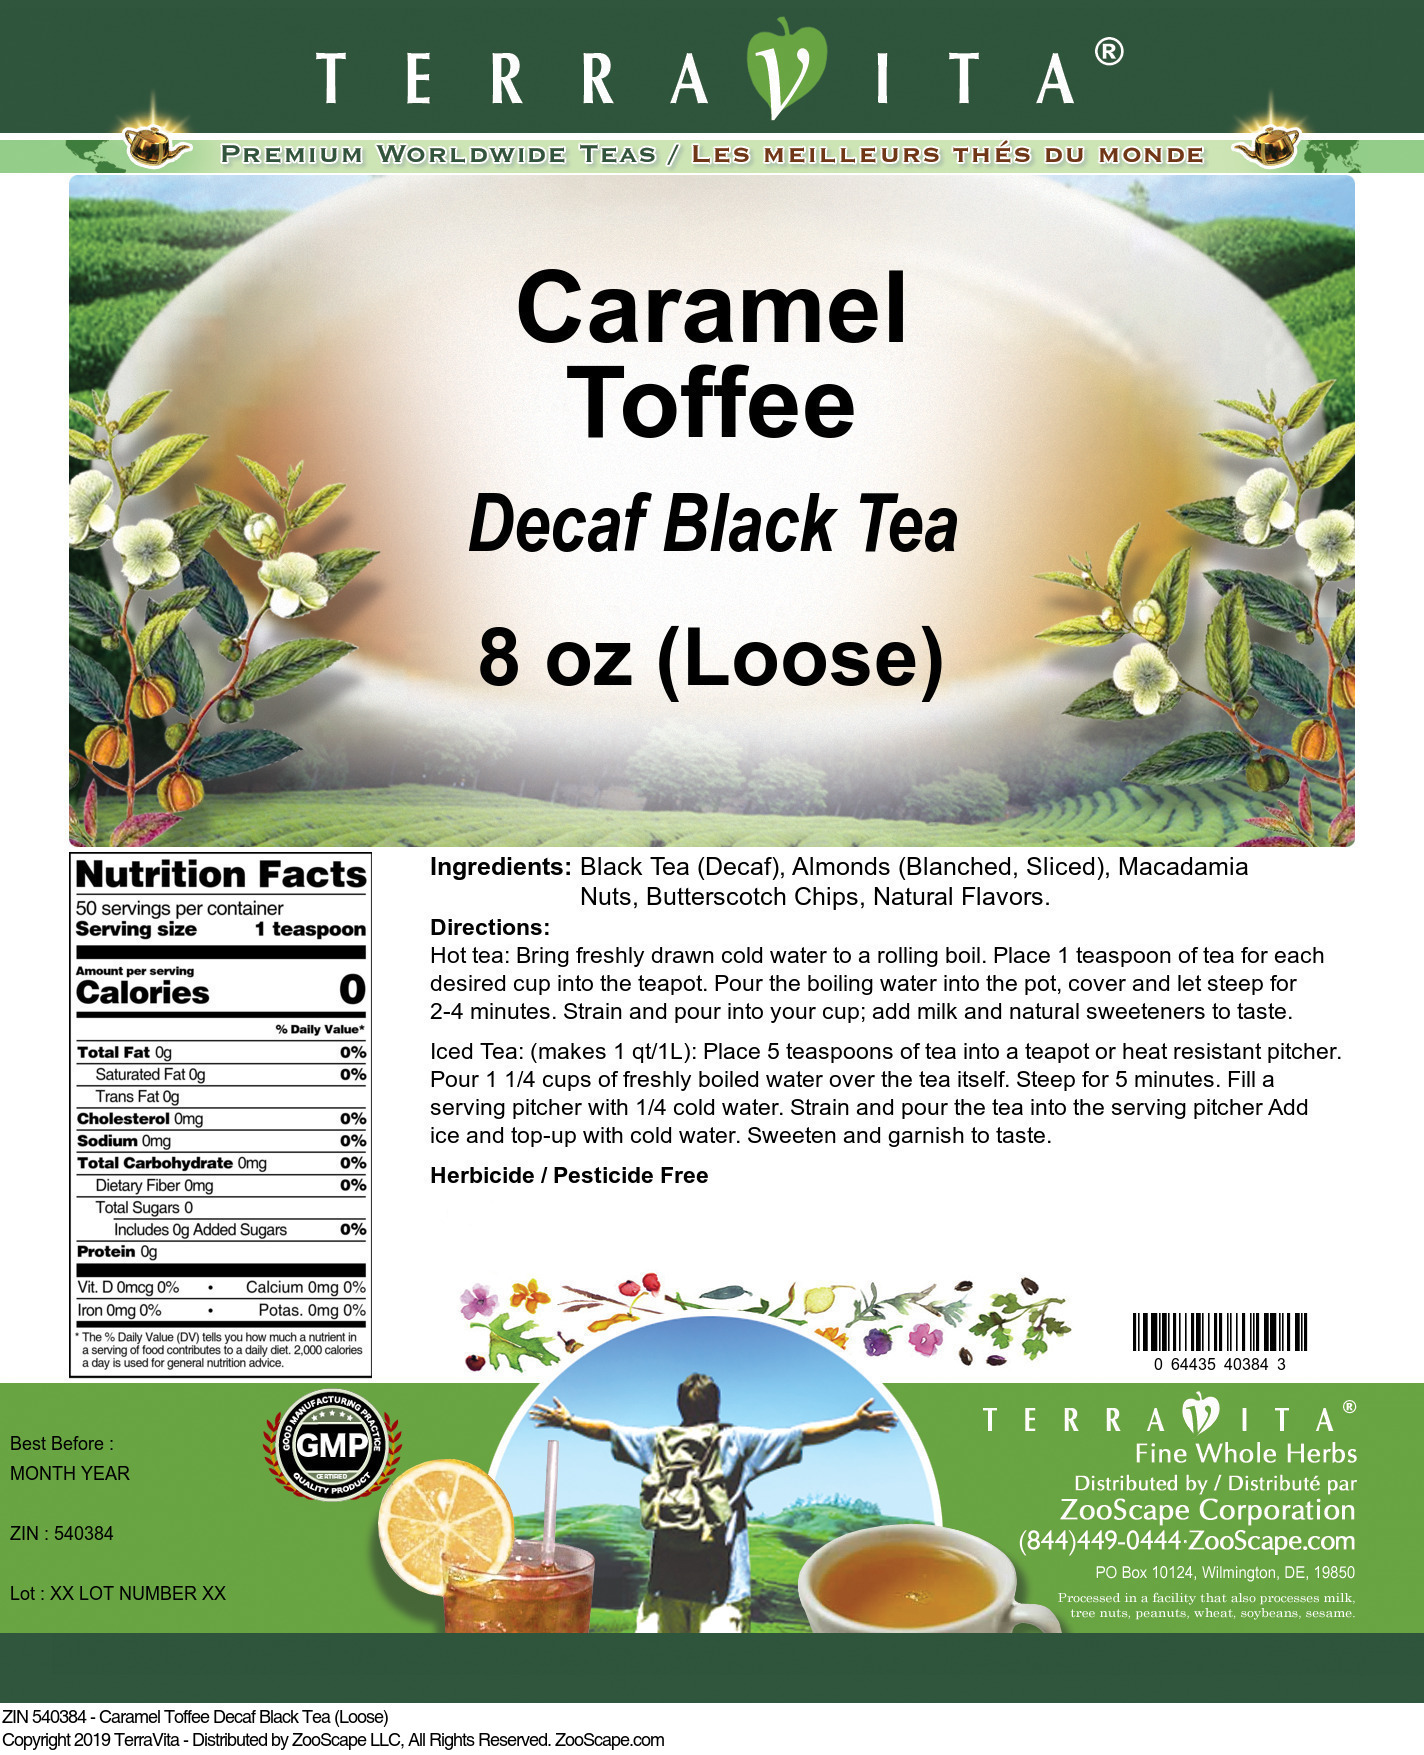 Caramel Toffee Decaf Black Tea (Loose)